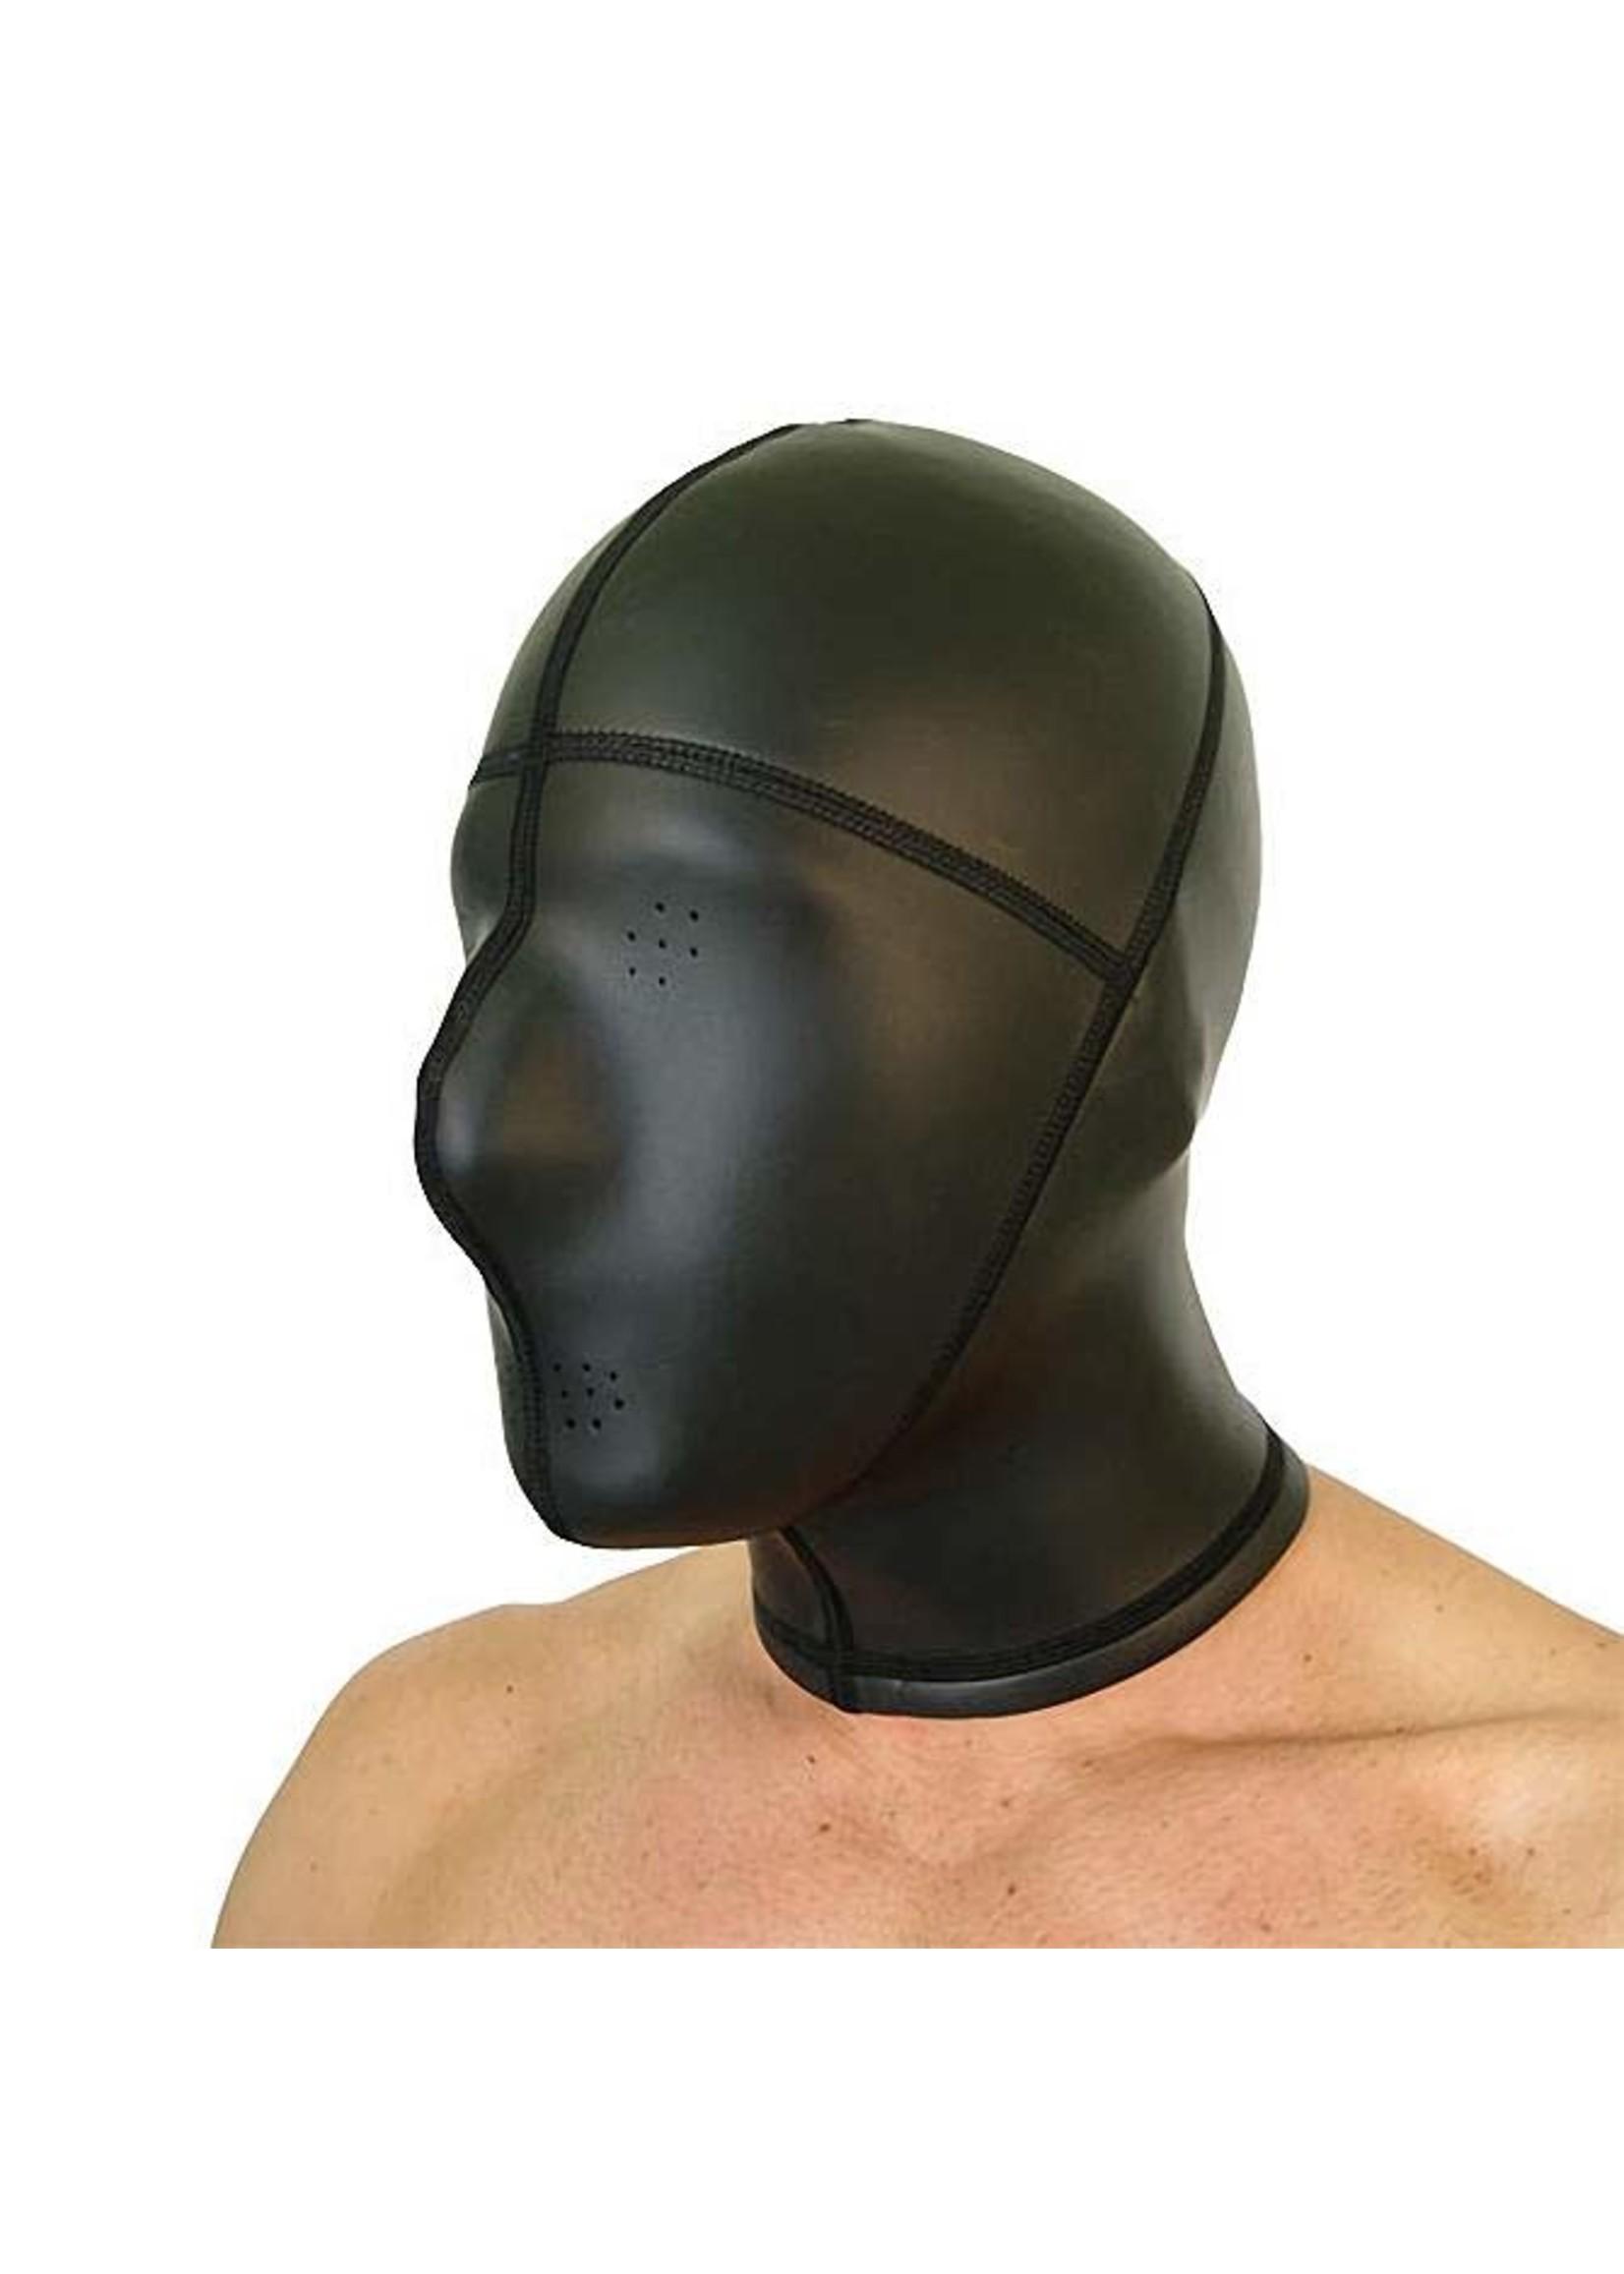 665 Leather 665 Neoprene Panel Hood w/ Pinhole Eyes & Mouth